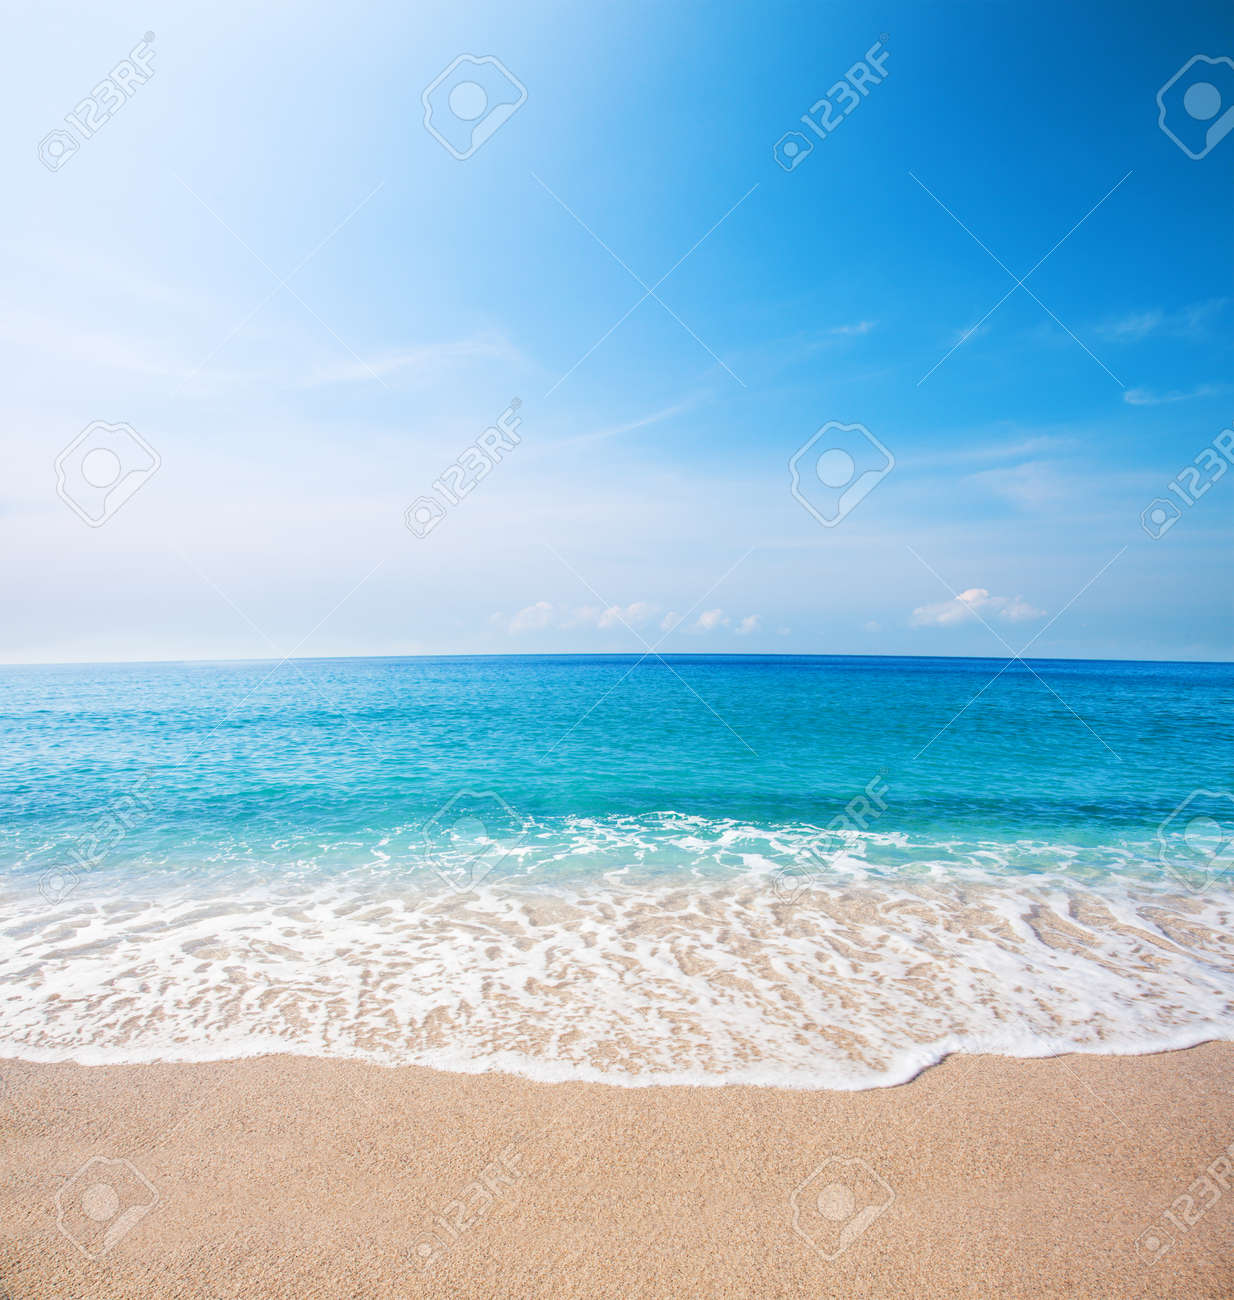 beach and beautiful tropical sea - 52698330